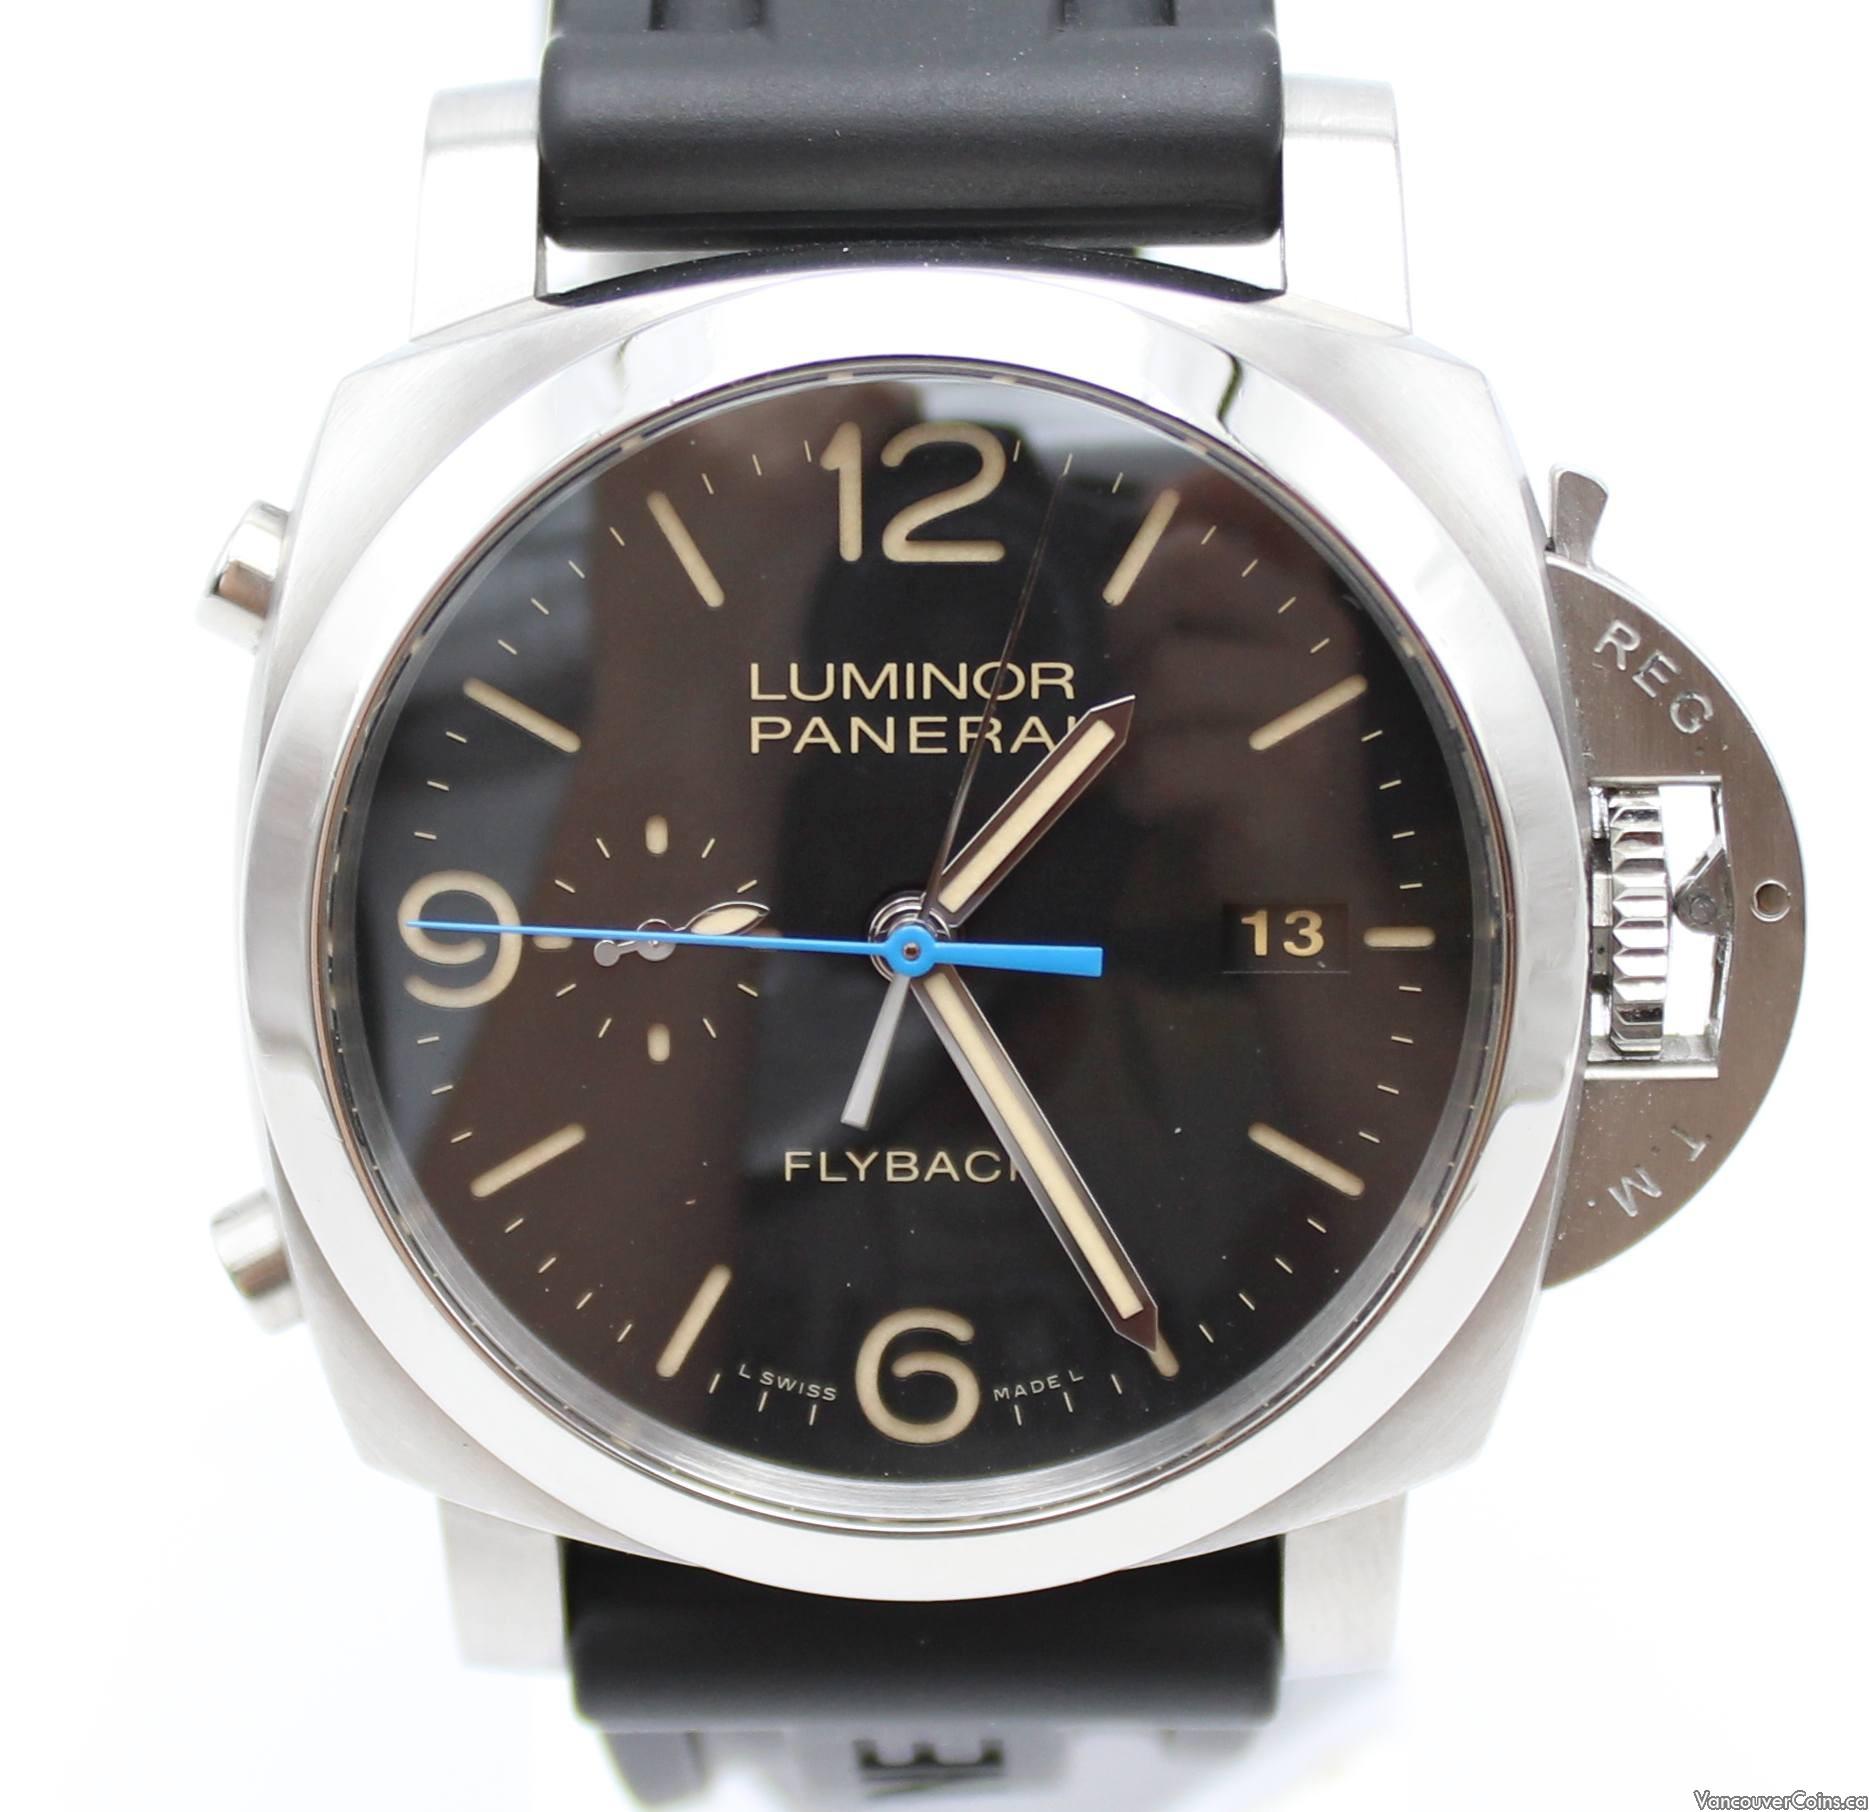 Panerai Luminor 1950 Flyback 3 Days Chrono Automatic Watch 44MM